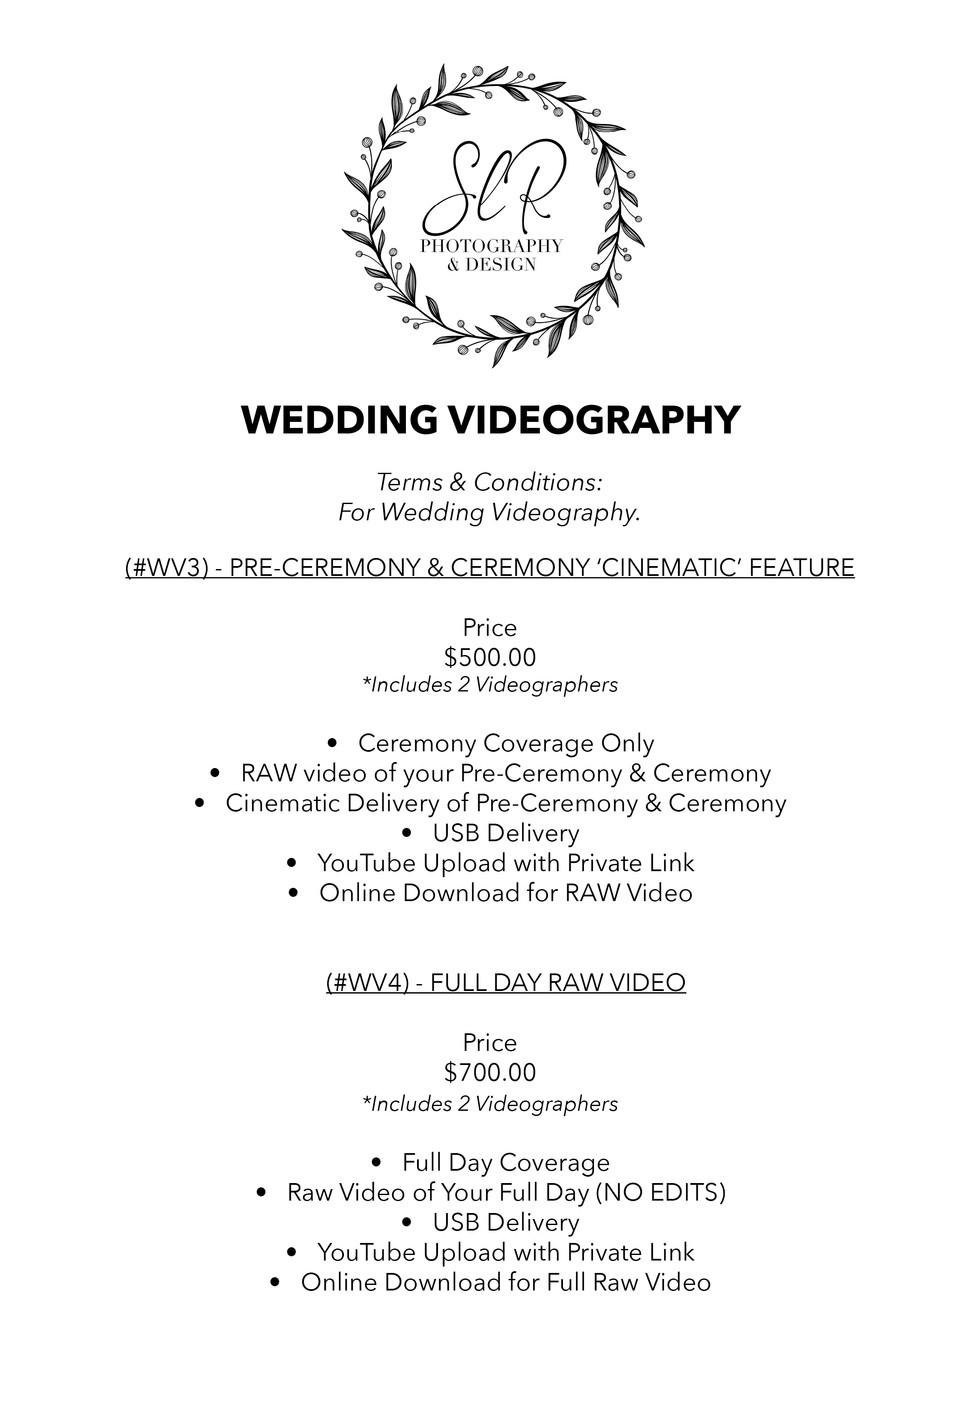 SLR Photography & Design price sheet -12